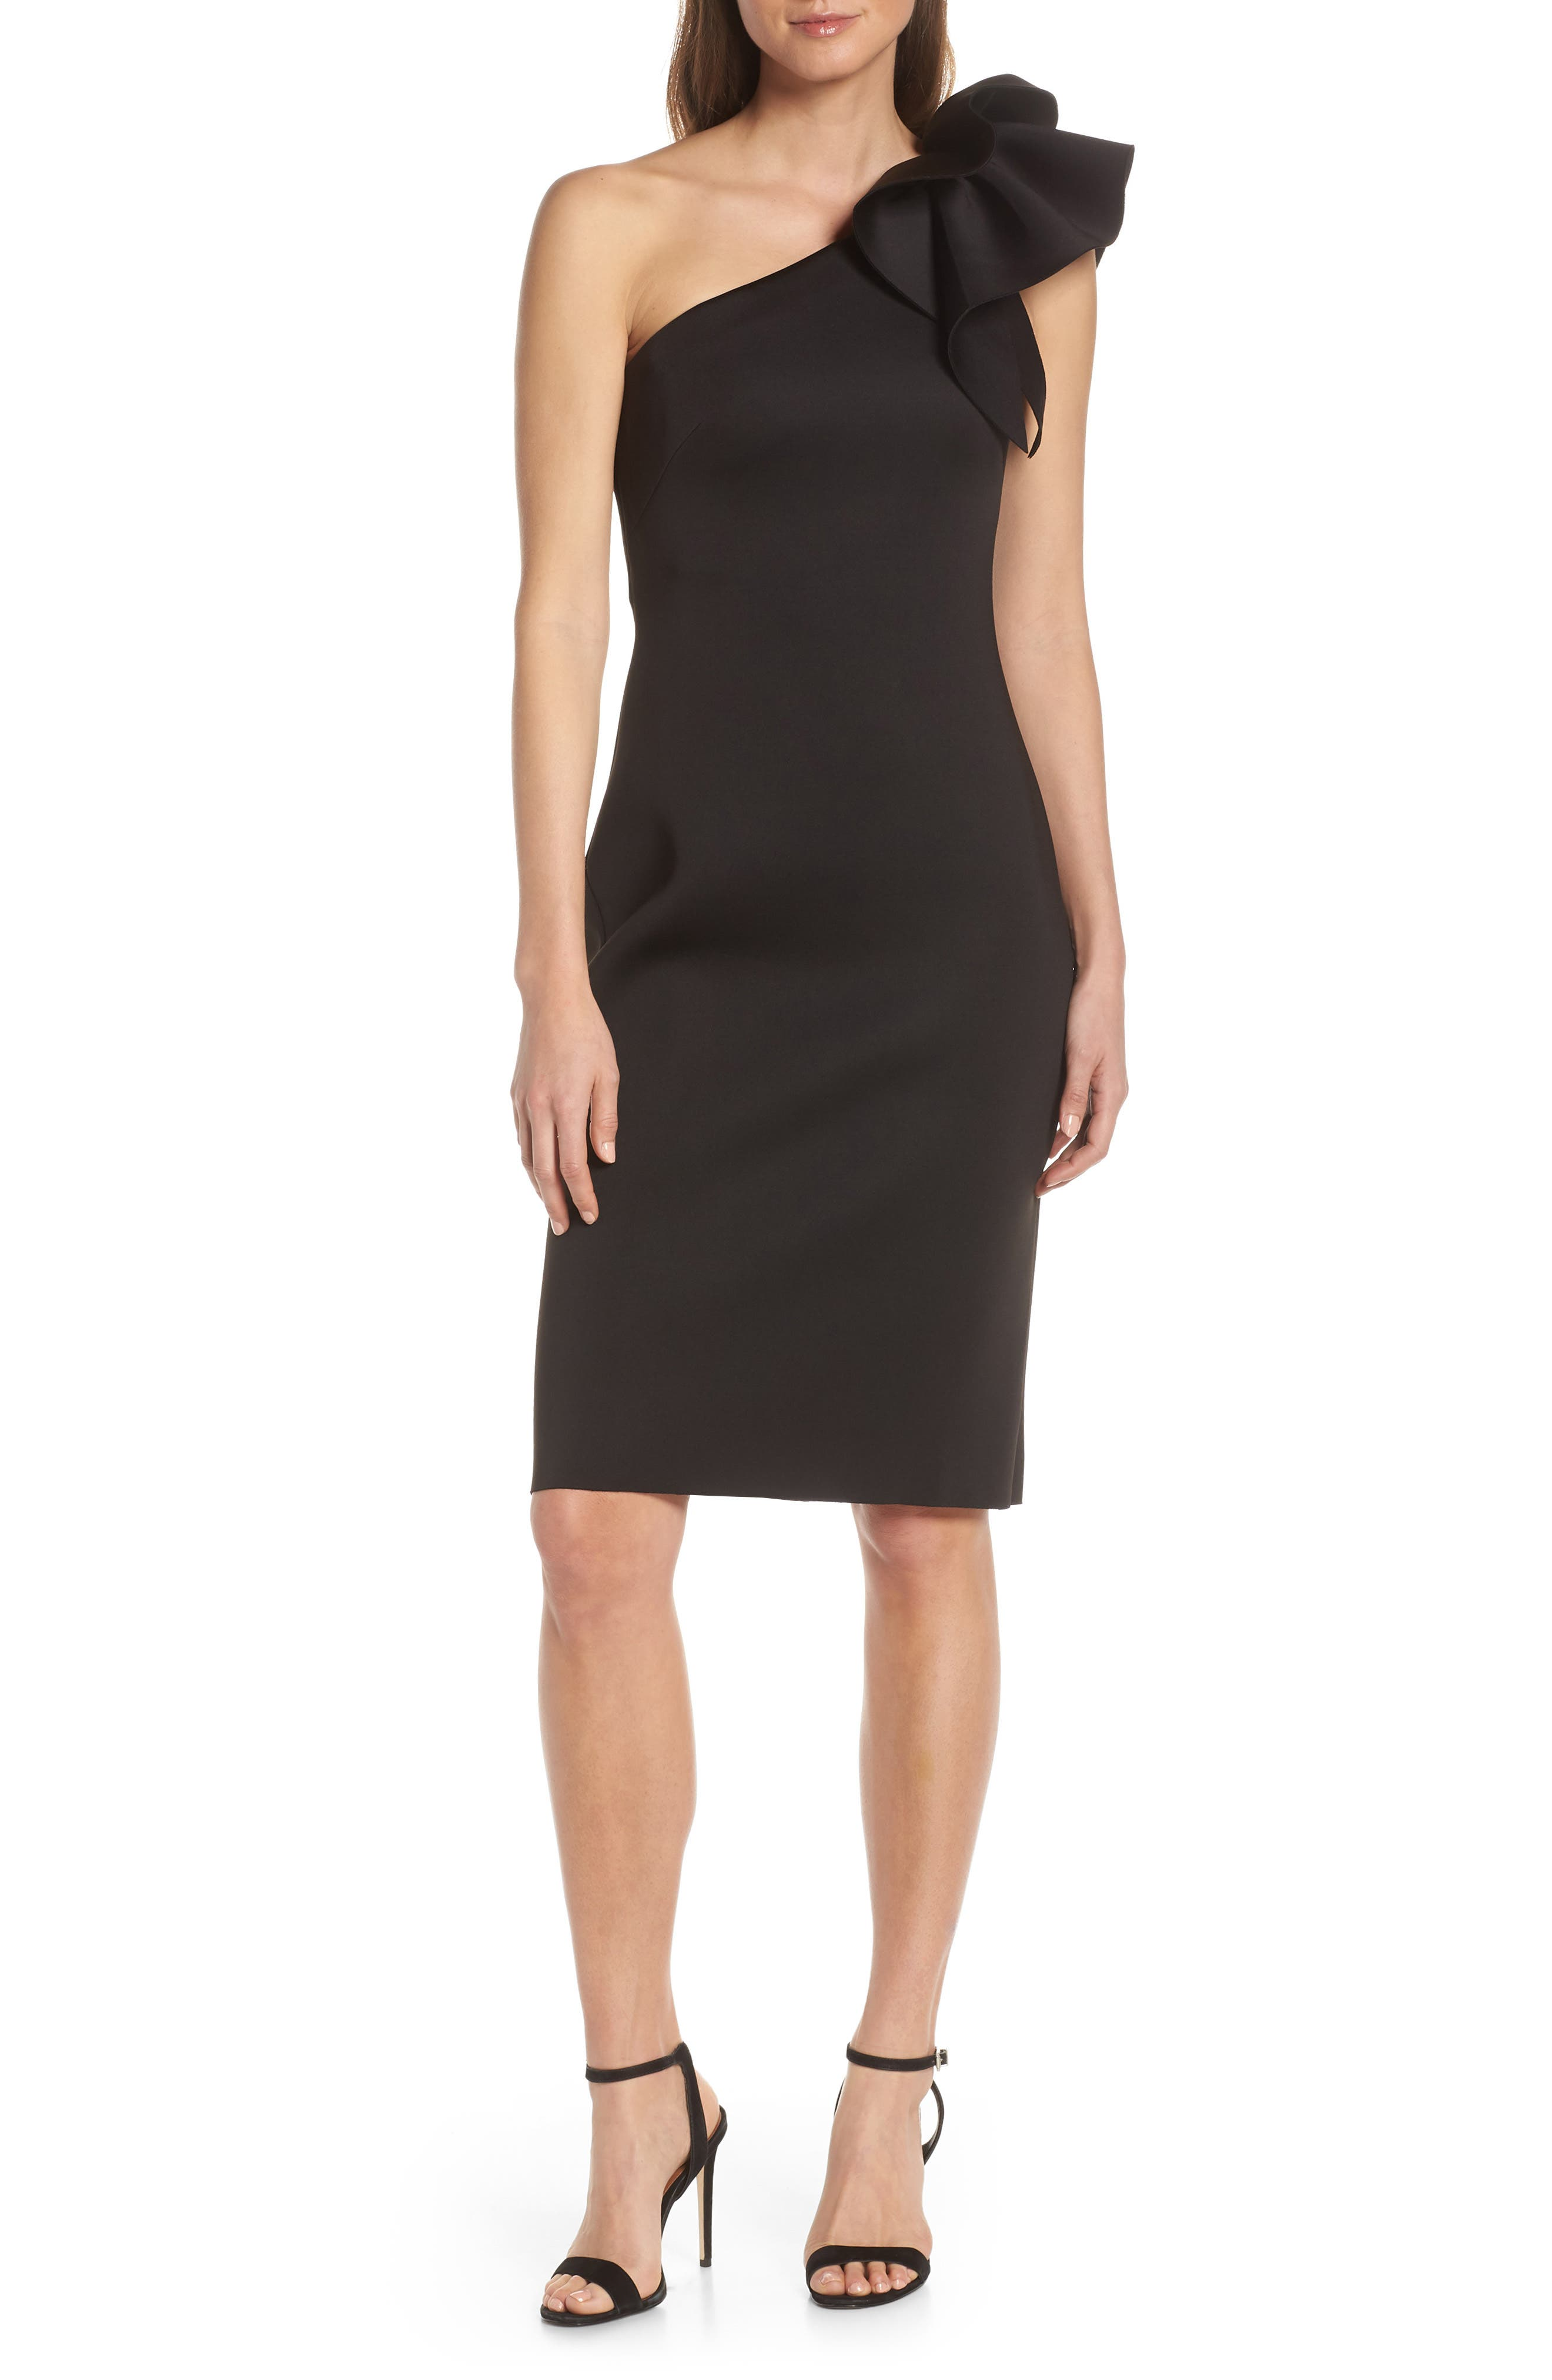 Eliza J One-Shoulder Ruffle Sheath Cocktail Dress, 8 (similar to 1) - Black